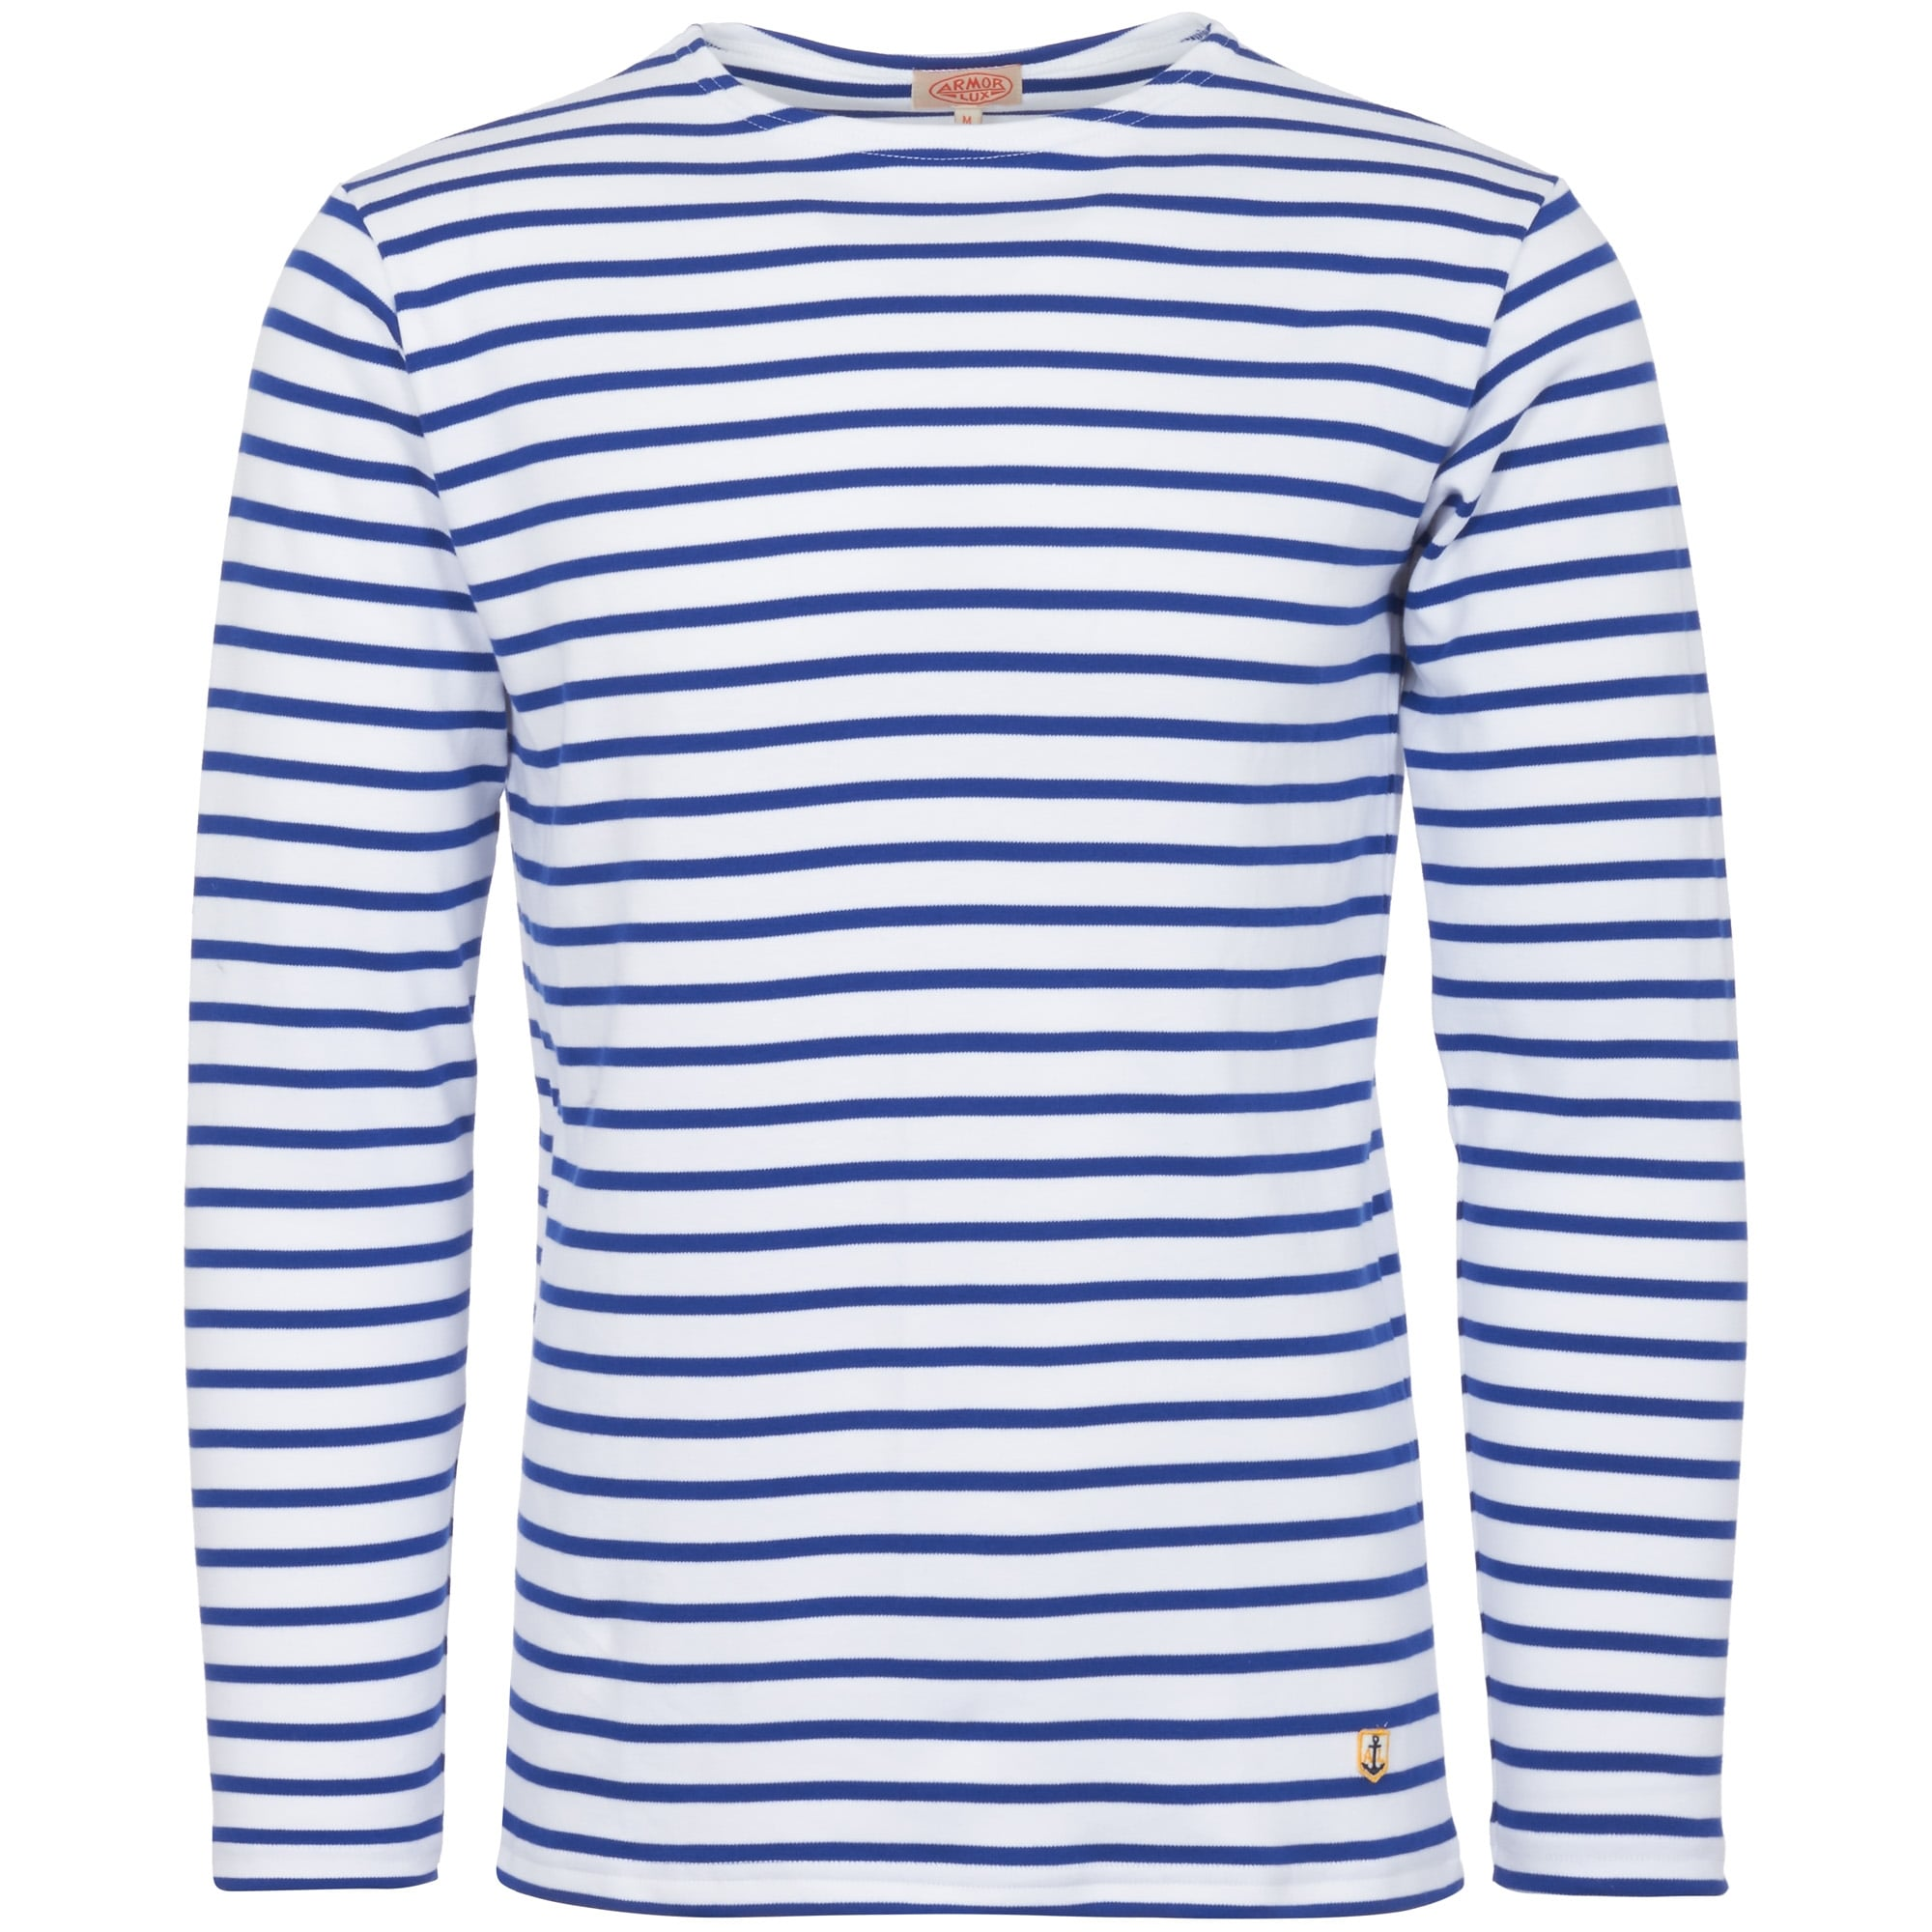 a237a8ed0e26c3 ... T-Shirt. White & Blue Star Long Sleeved Breton Sailor ...